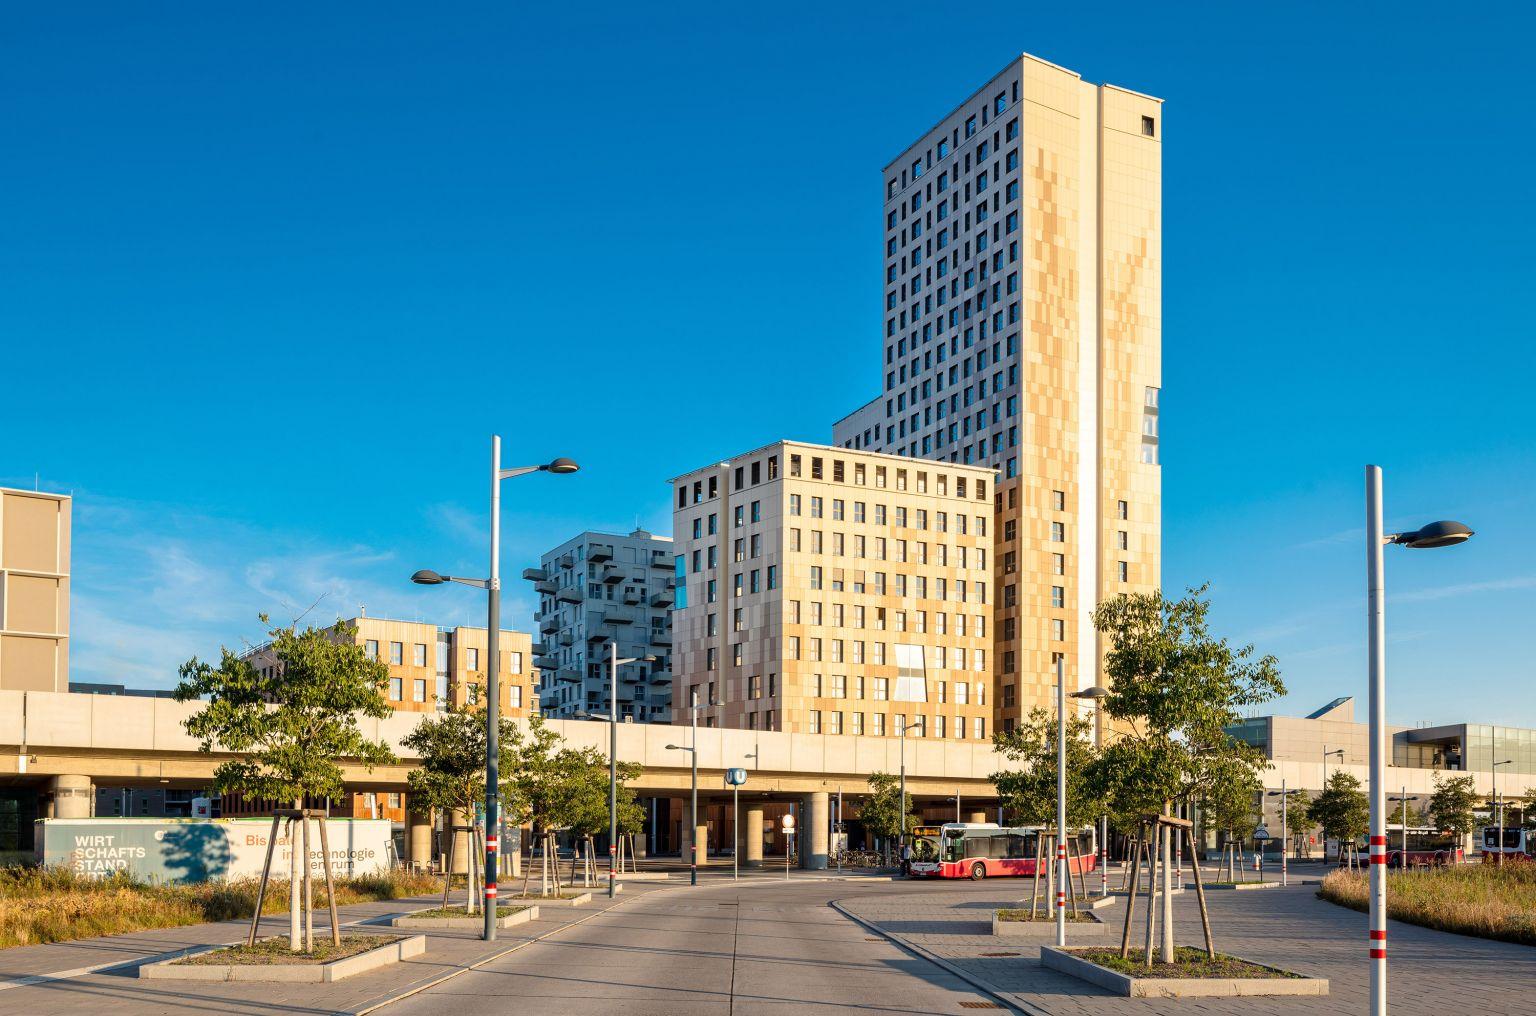 Dormero HoHo Hotel eröffnet